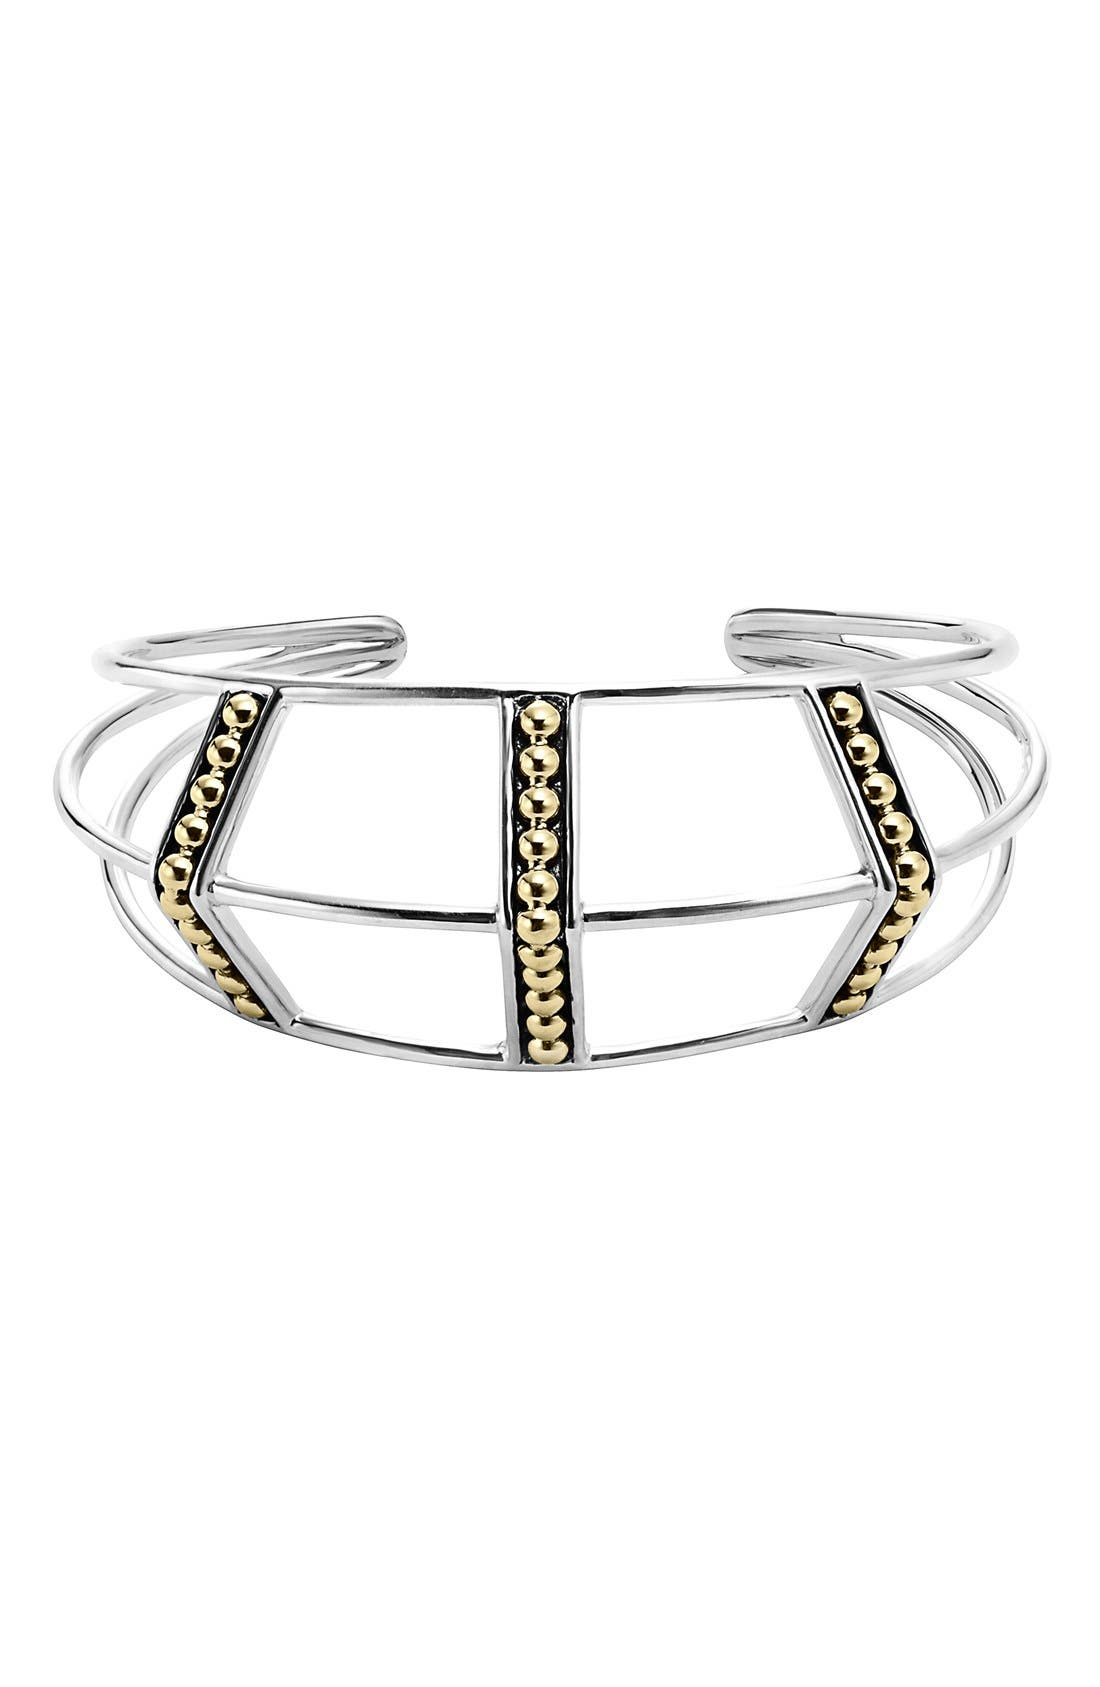 'KSL' Pyramid Wrist Cuff,                         Main,                         color, SILVER/ GOLD